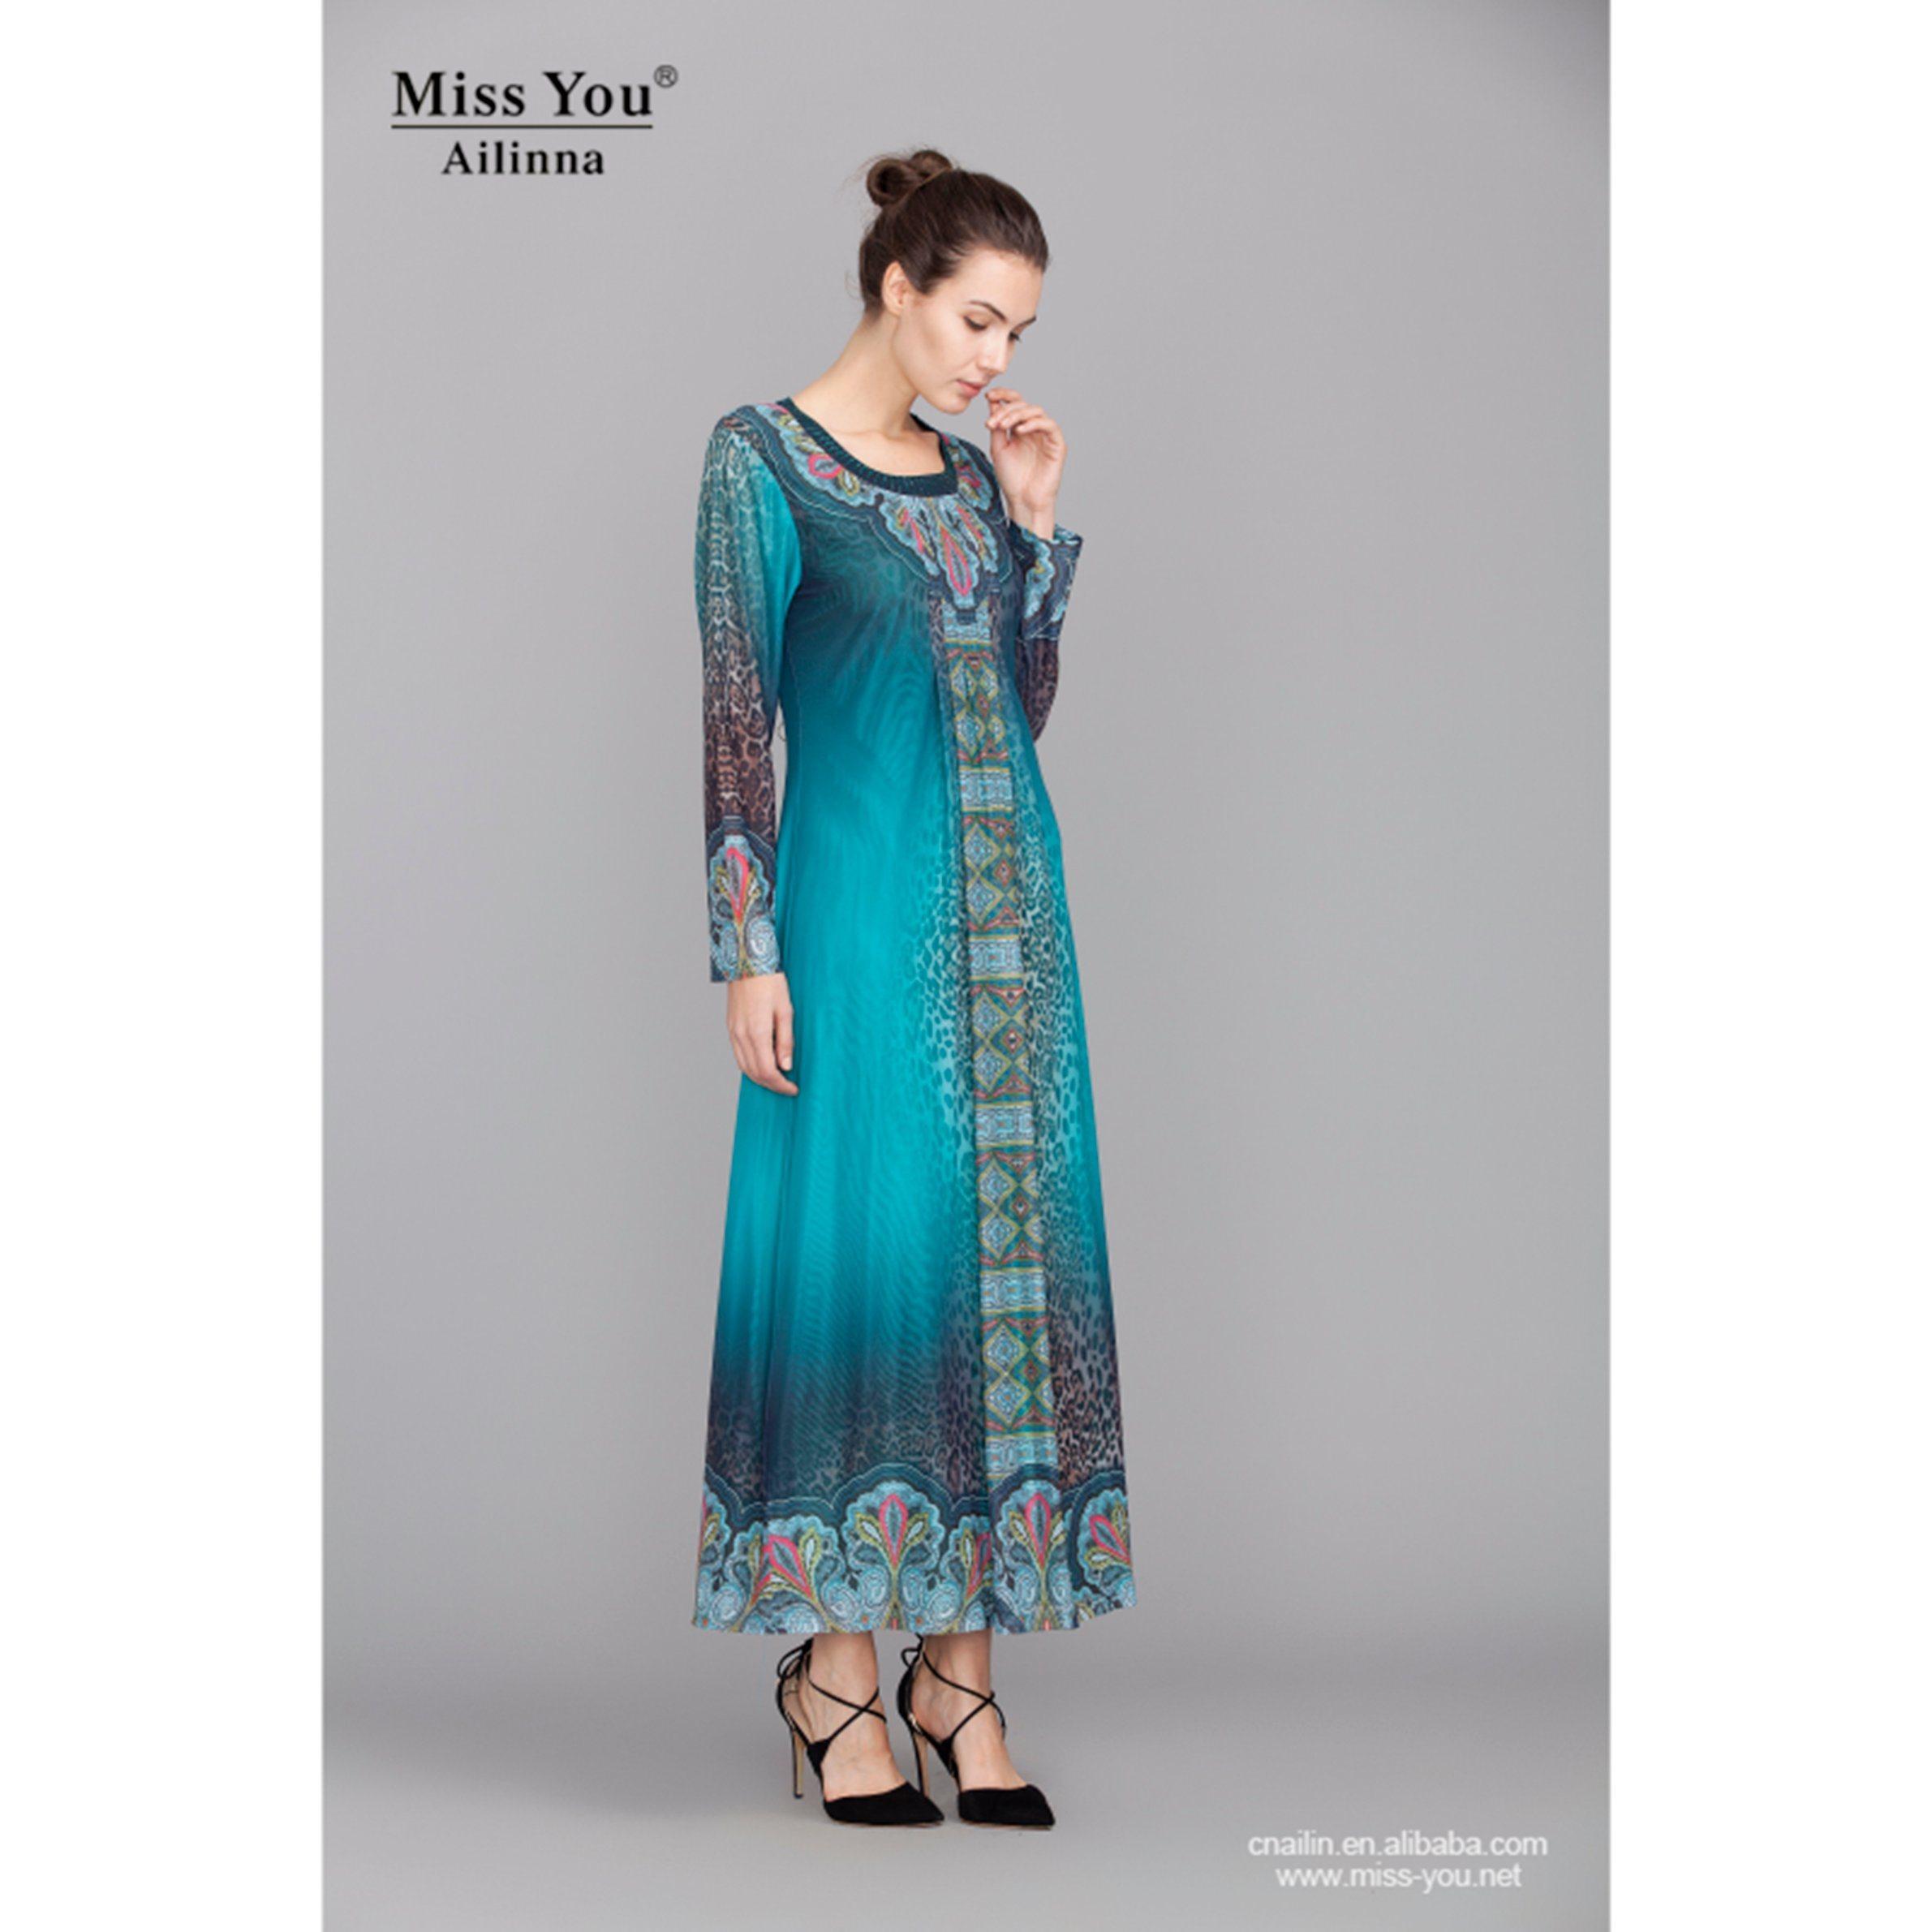 Miss You Ailinna 300631-2 Ladies Fashion Abaya Soft Indian Muslim Dress Distributor